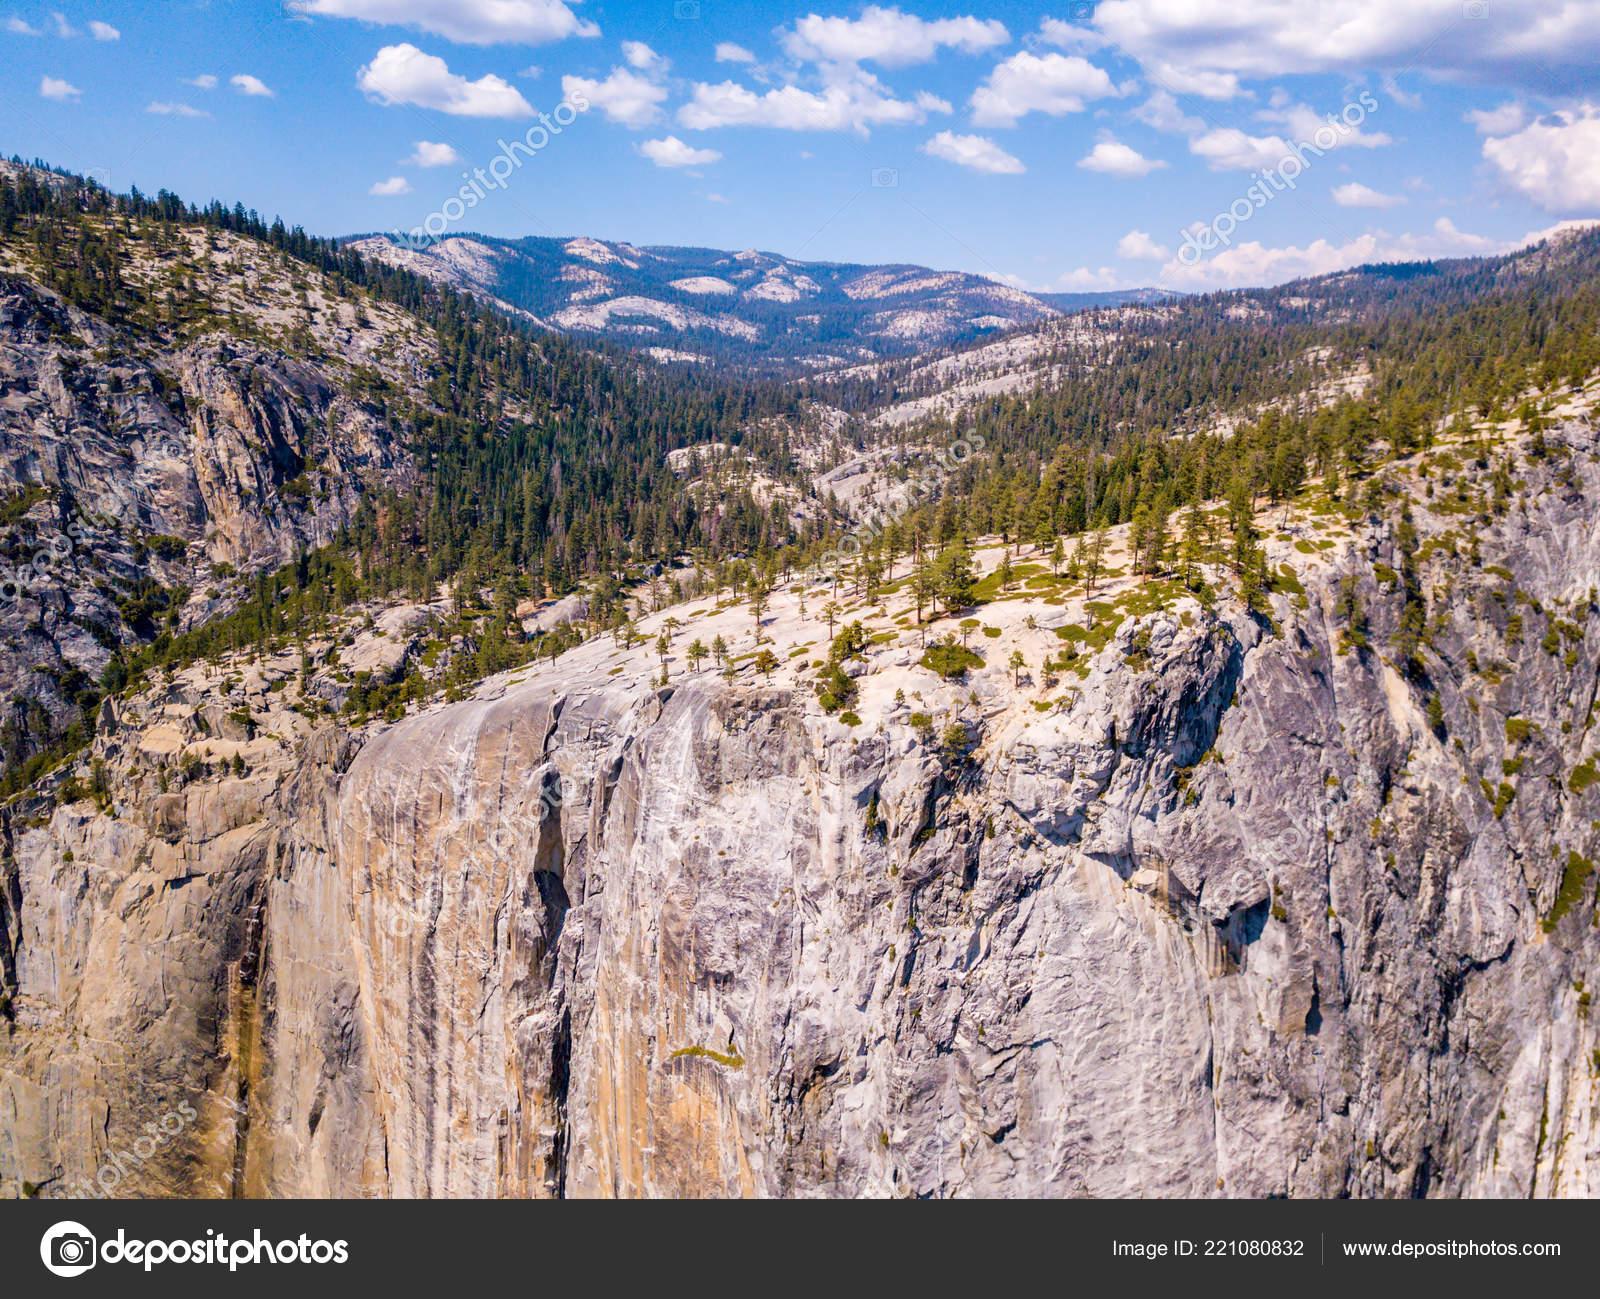 Aerial View Yosemite National Park Capitan Half Dome Cliff